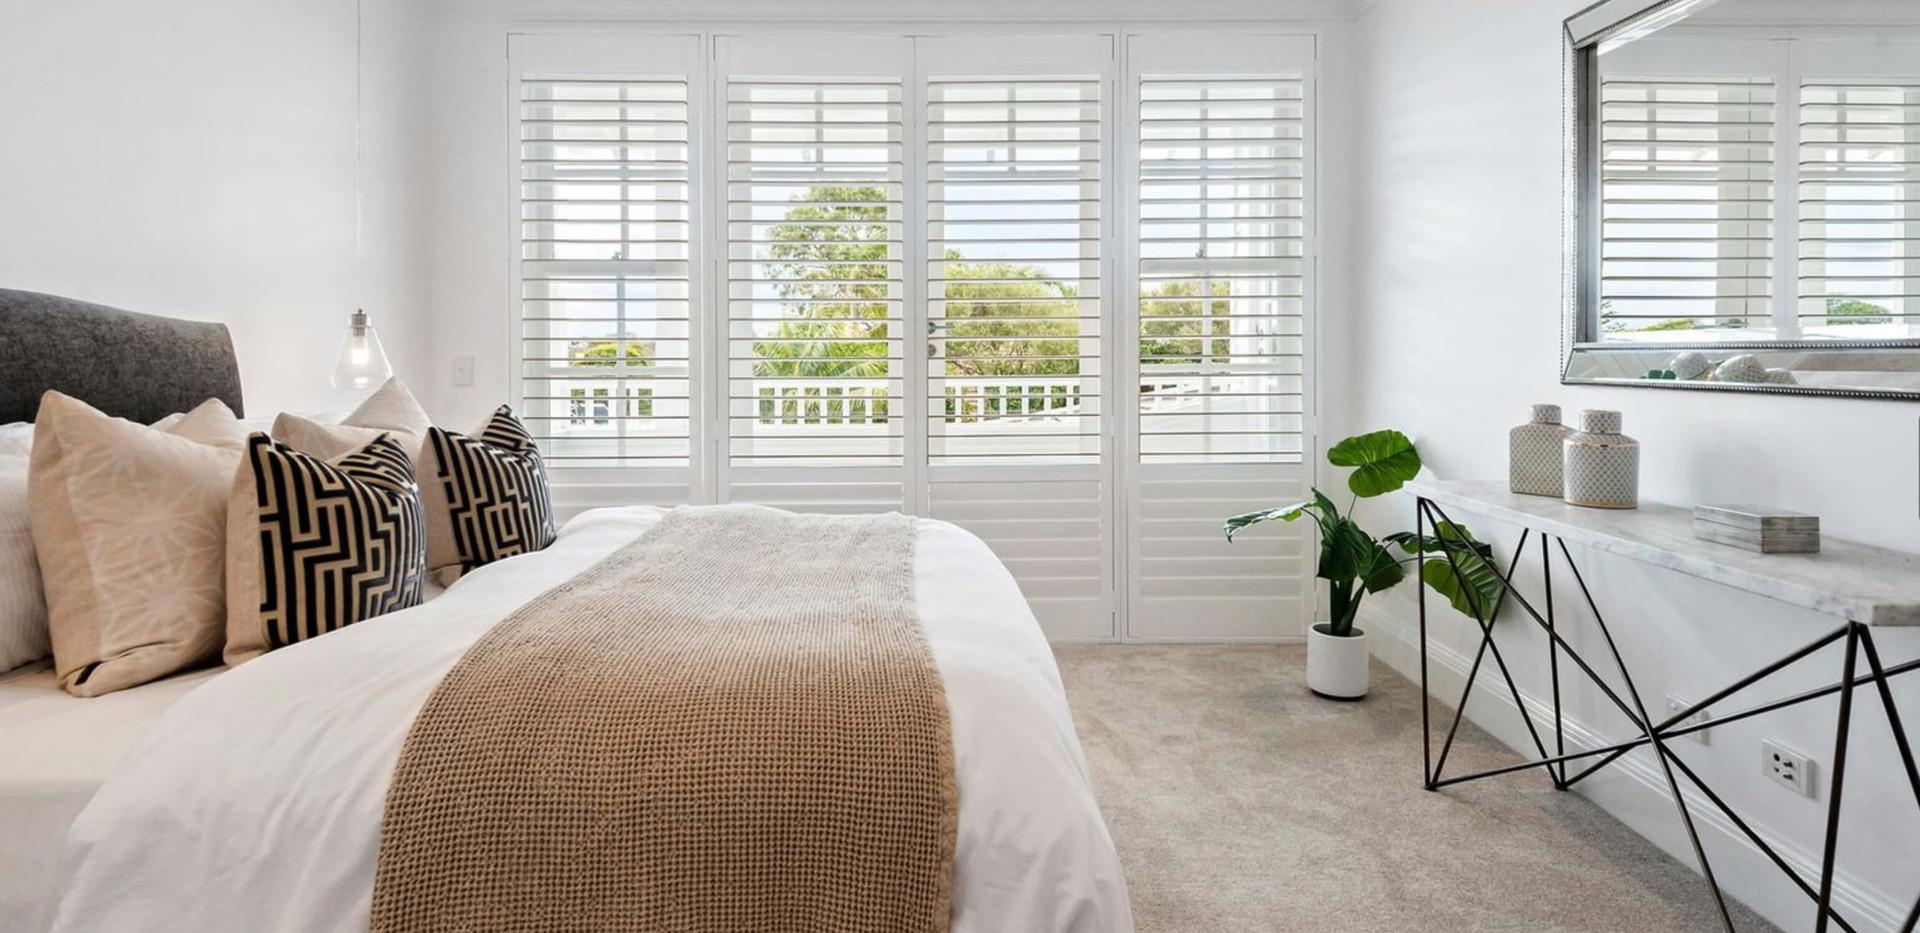 Seaforth Hamptons House - Residential bedroom interior design